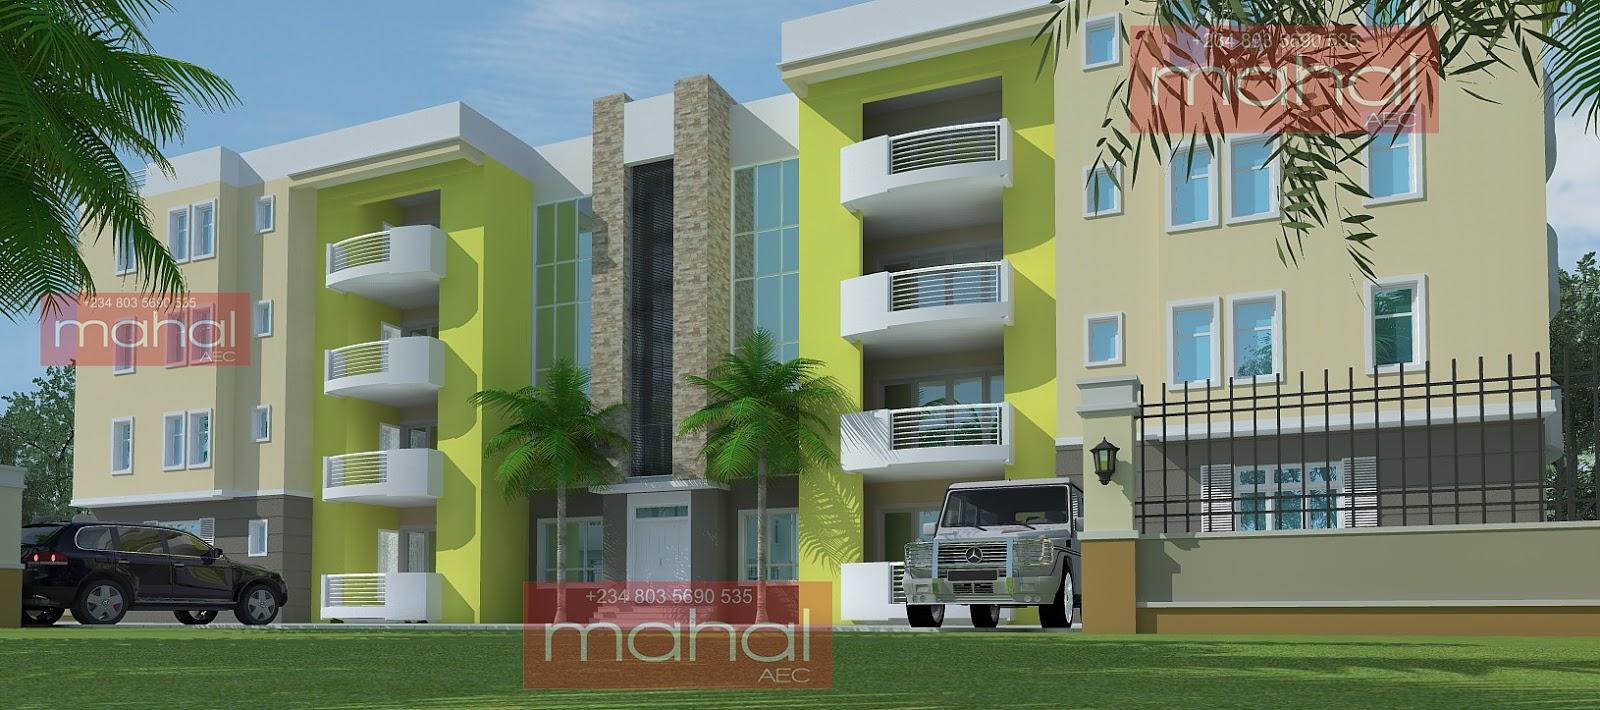 Contemporary nigerian residential architecture oniru flats for Apartment plans in nigeria